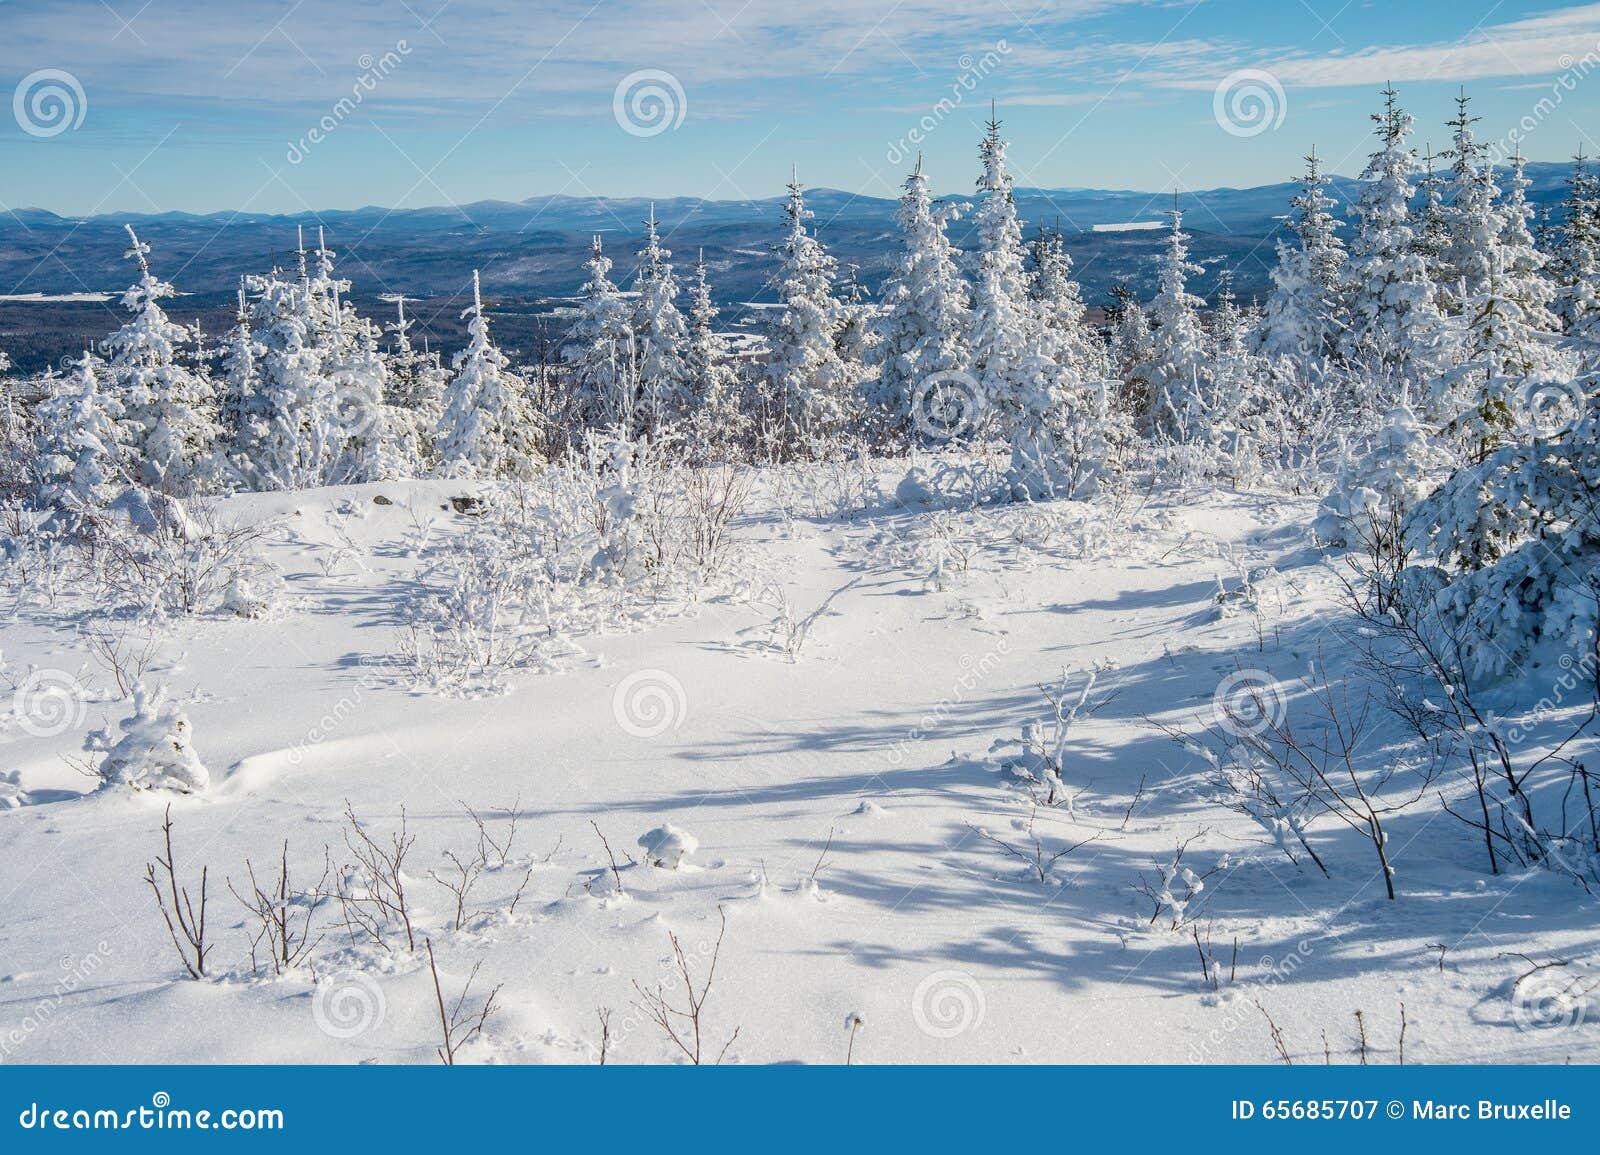 Beautiful snowy landscape in Quebec, Canada